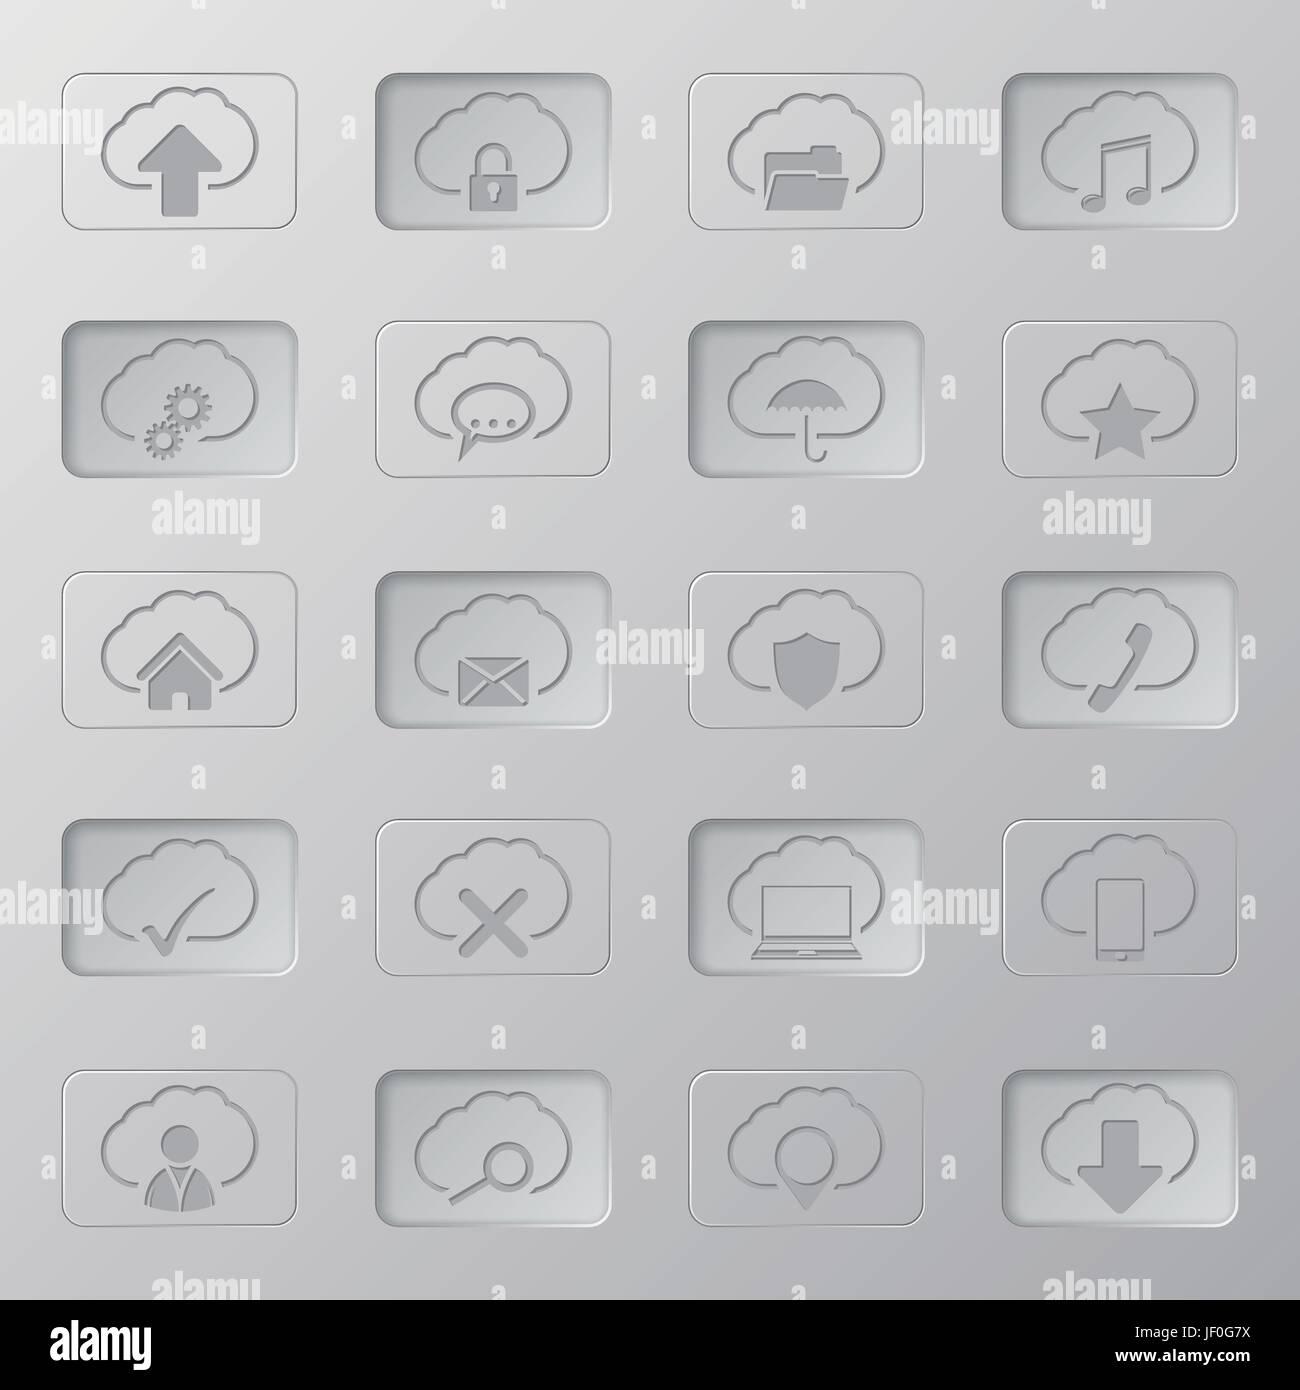 cloud, sign, icon, computers, computer, pictogram, symbol, pictograph, trade Stock Vector